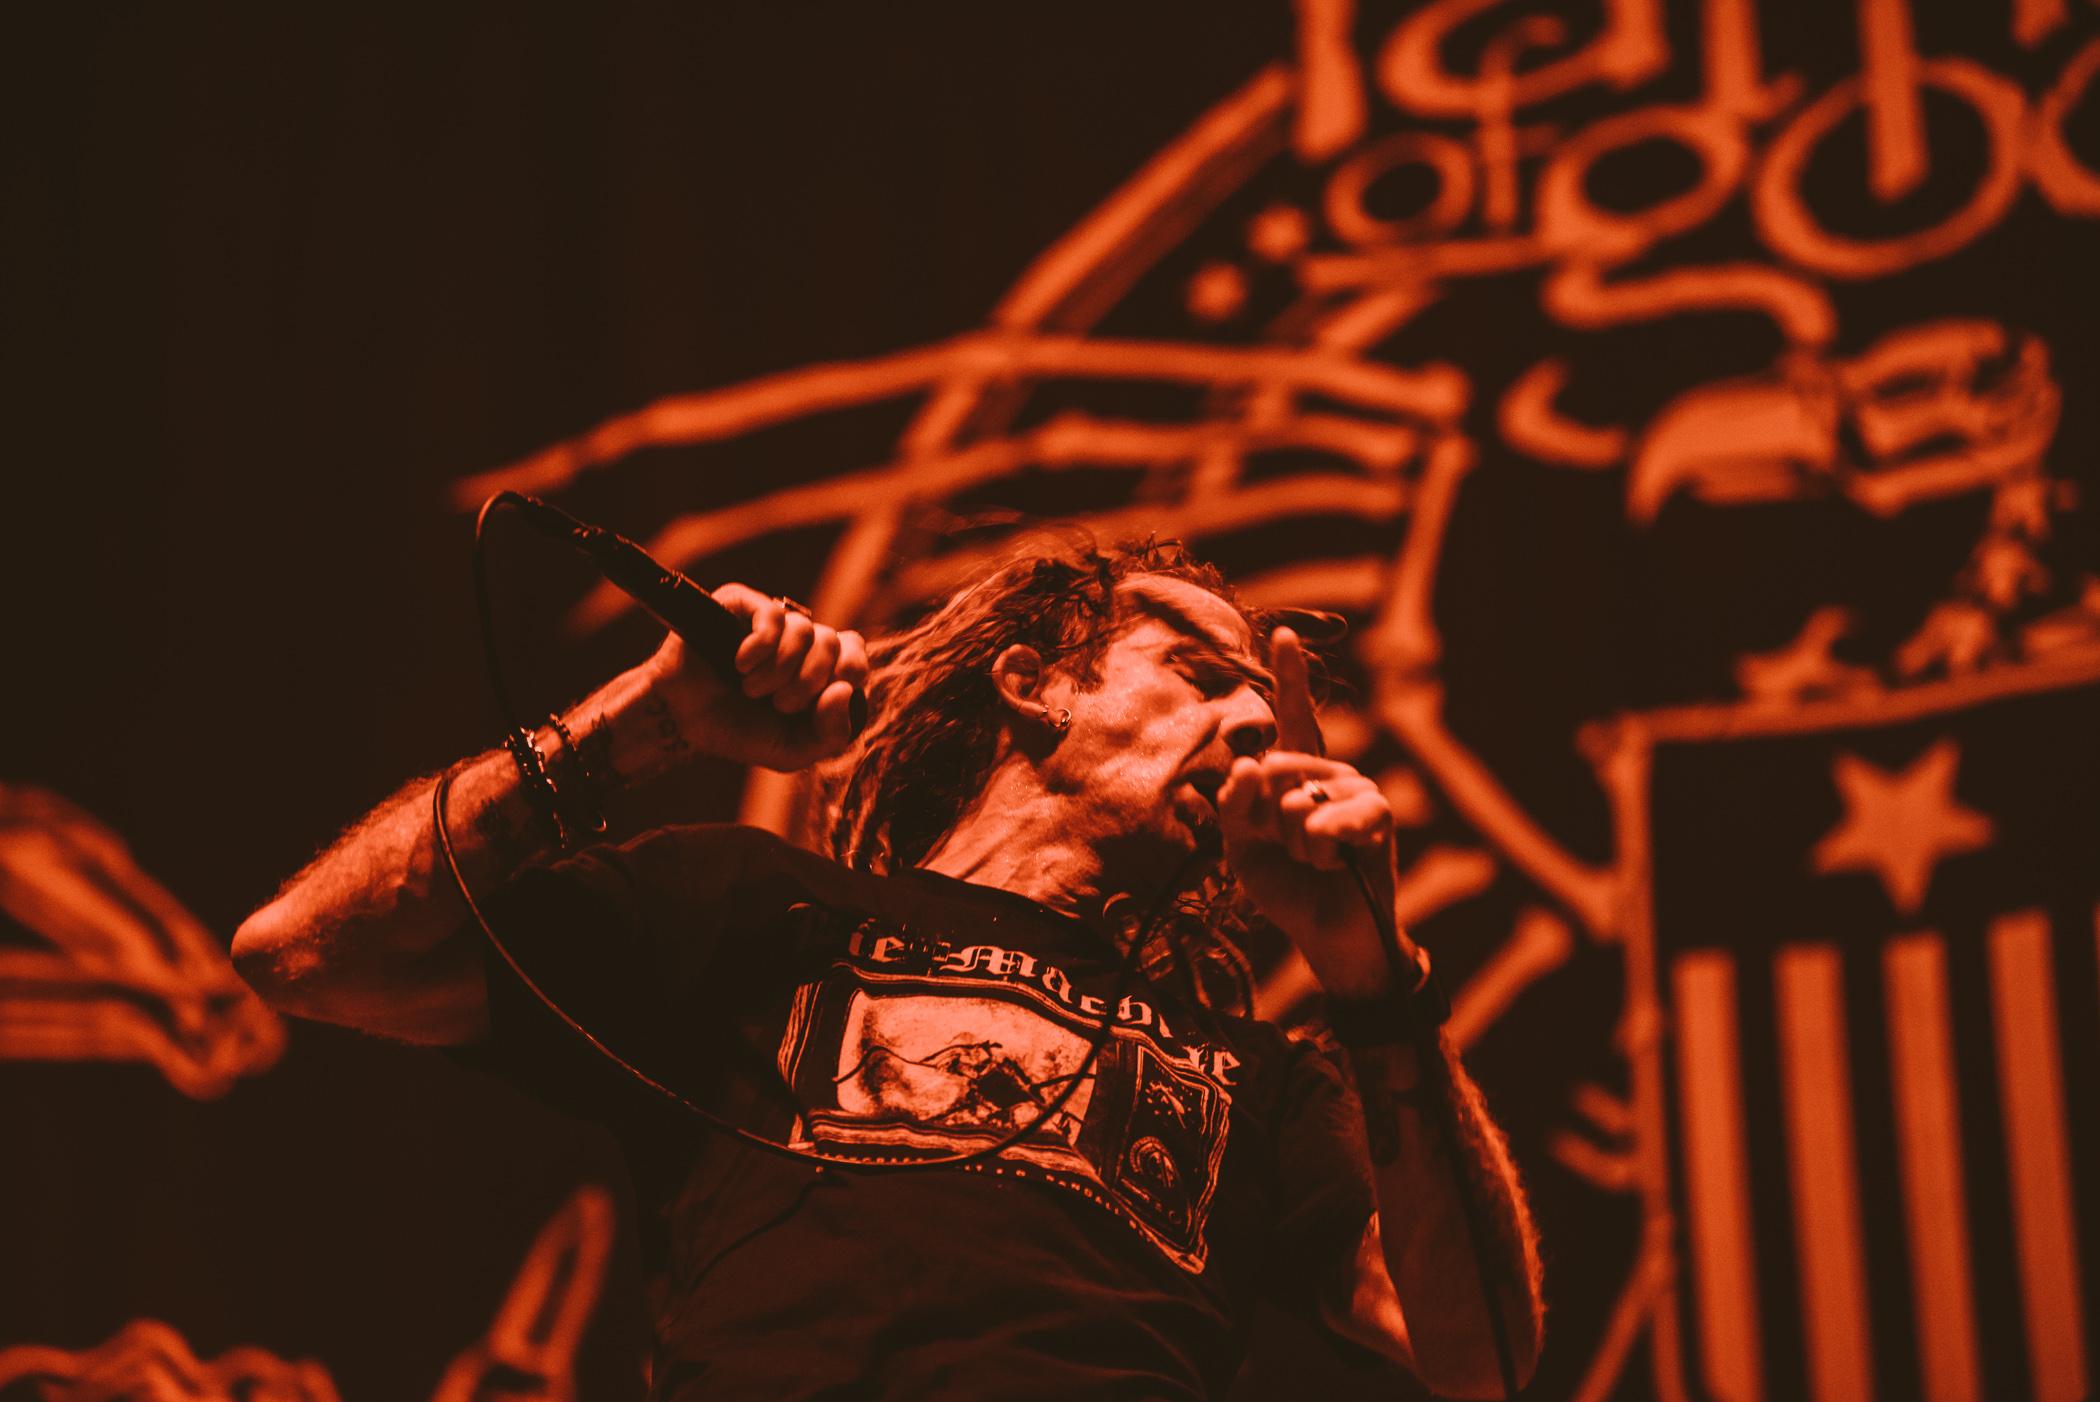 1_Lamb_Of_God-Pacific_Coliseum-Vancouver-Timothy_Nguyen-20180516 (1 of 47).jpg